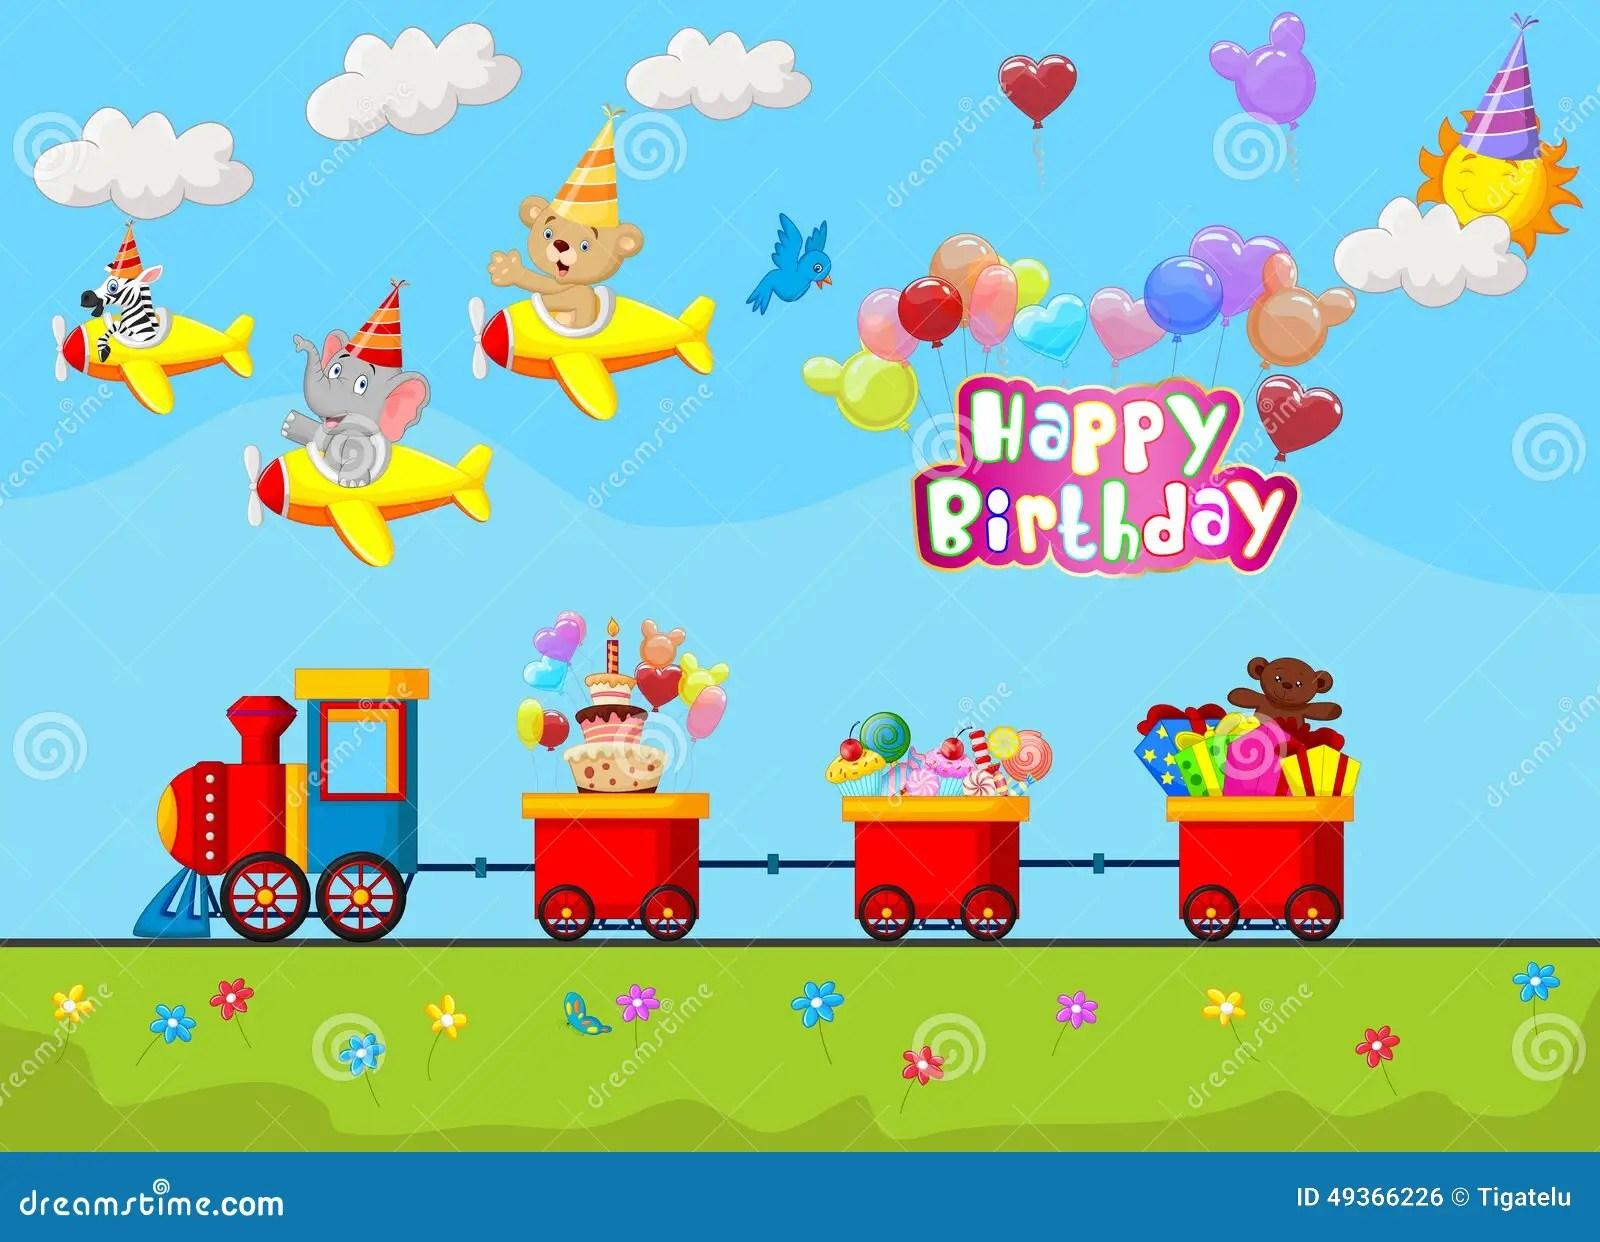 Colorful Animal Print Wallpaper Birthday Background Cartoon Stock Vector Image 49366226